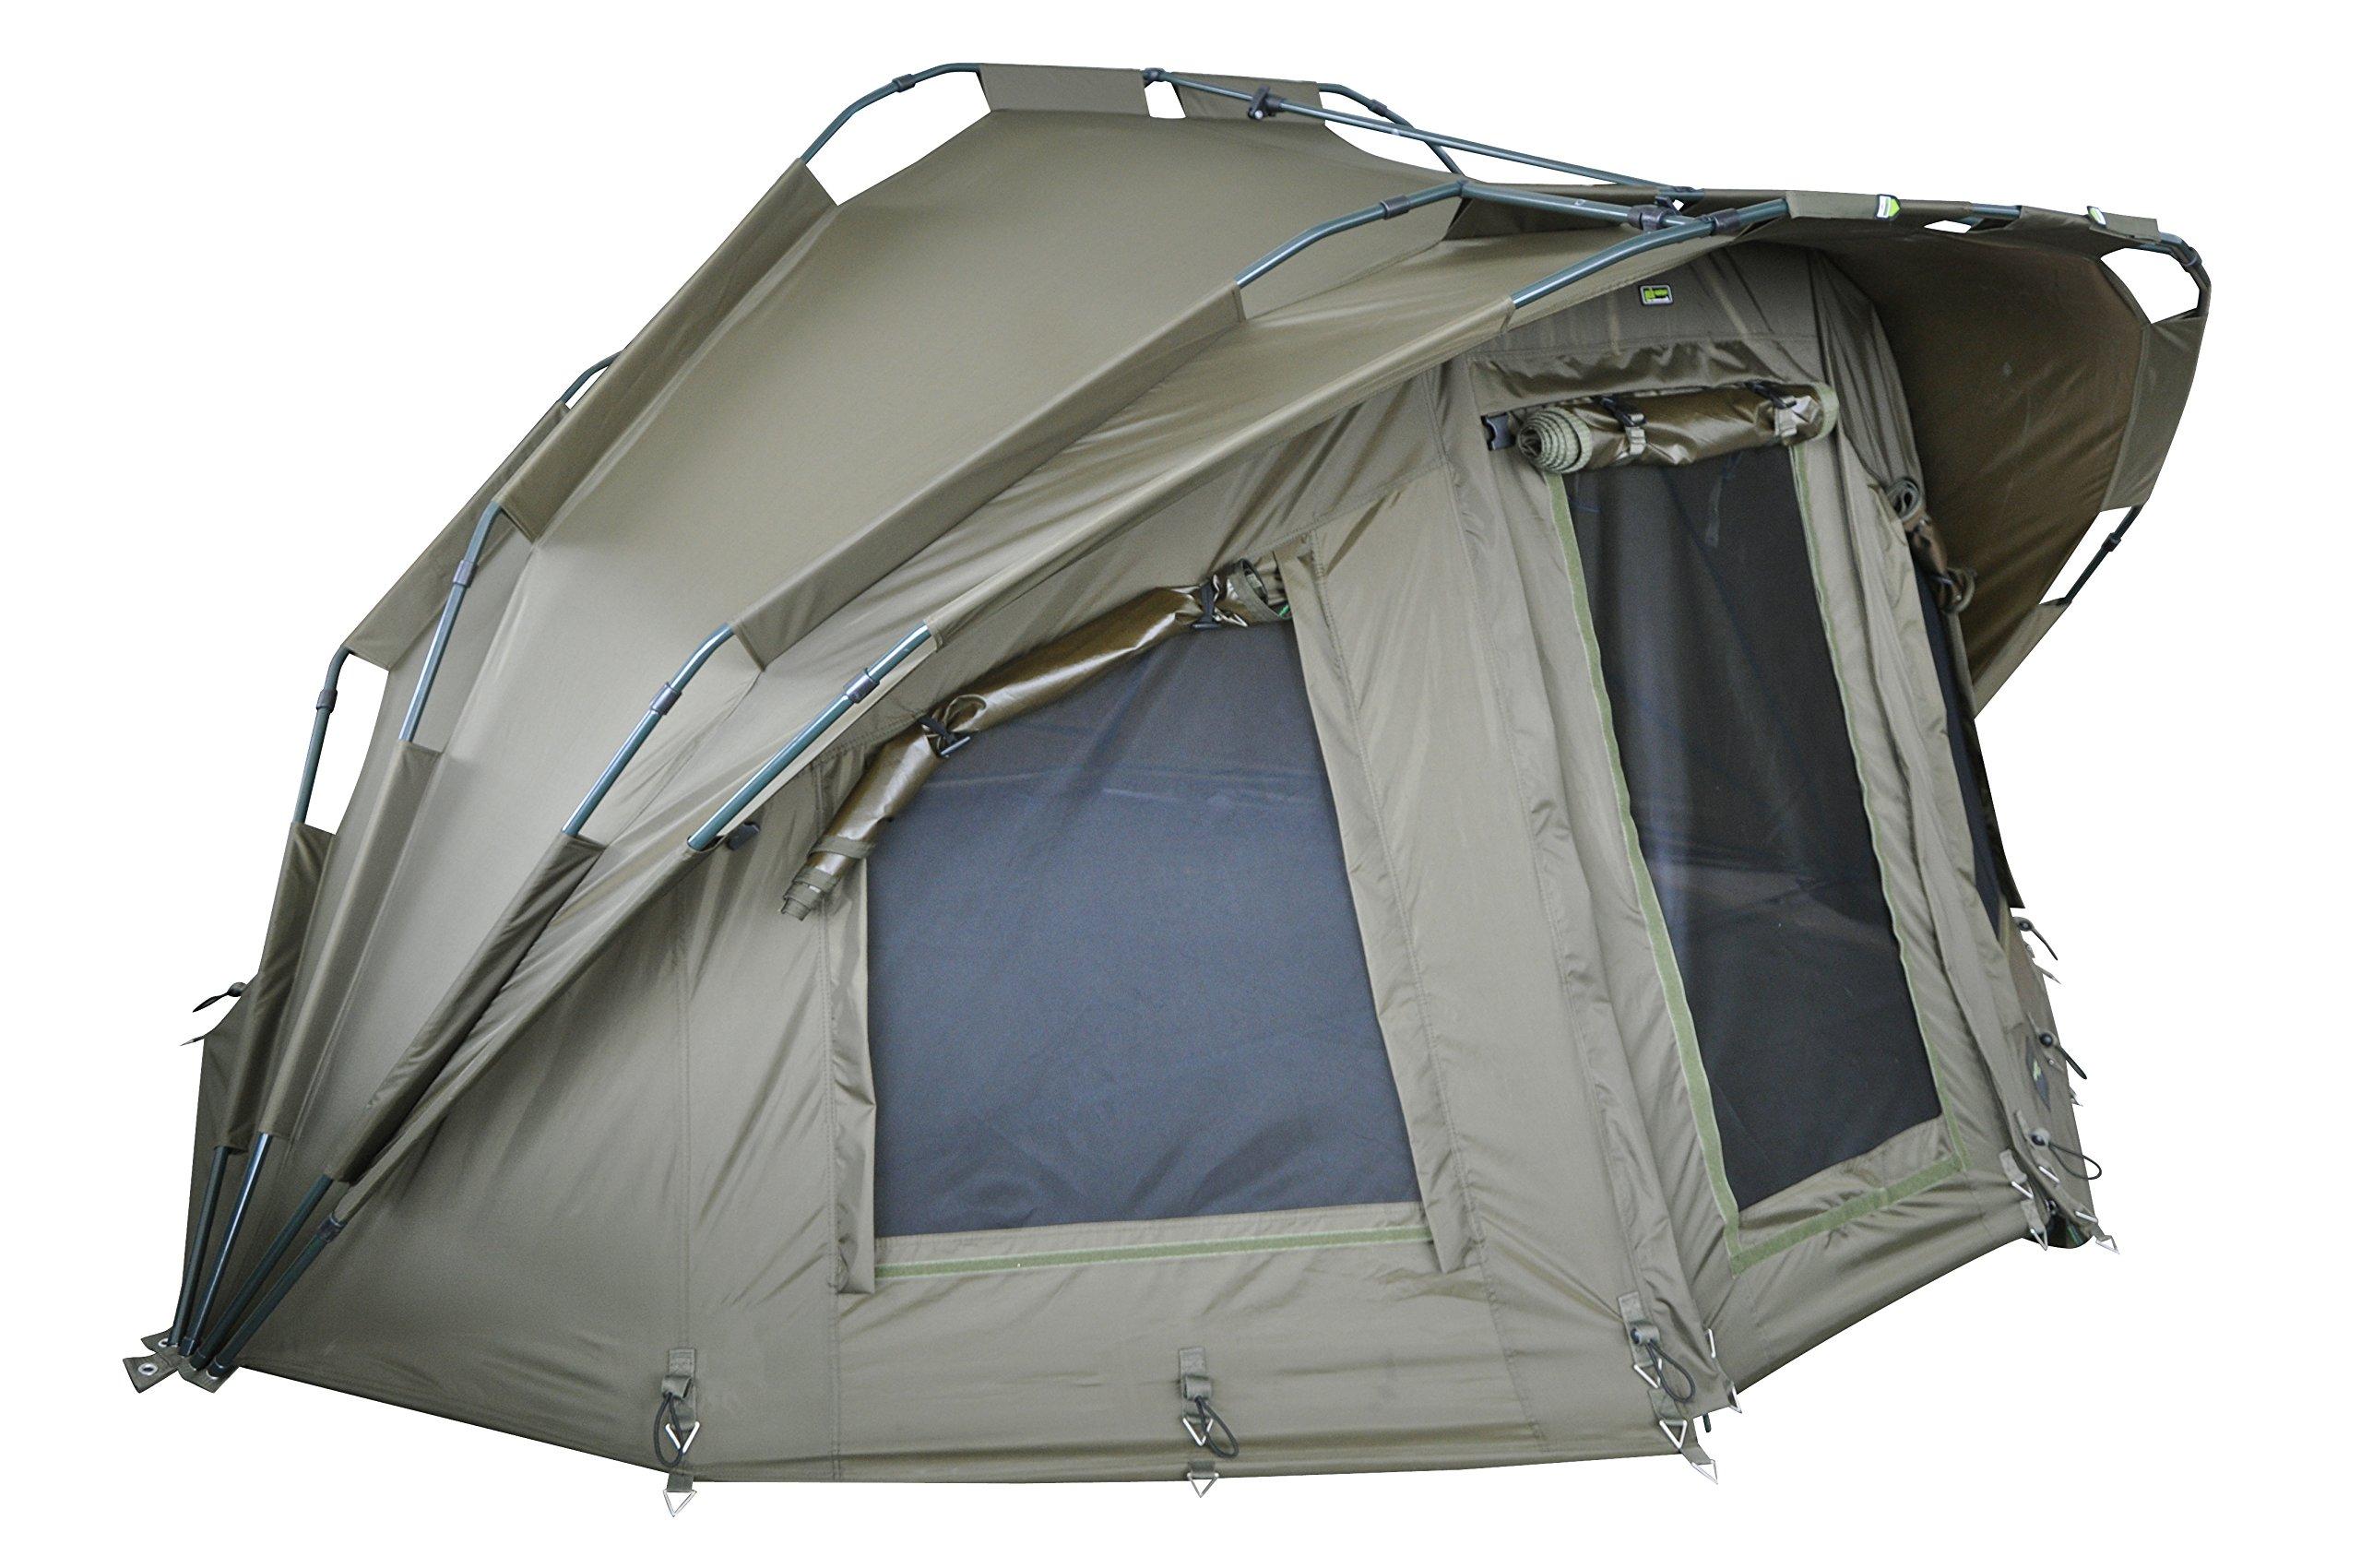 Winterskin 2 Bedchairs 2 Carpchairs Karpfen Carp Fort Knox 3,5 Man Bivvy